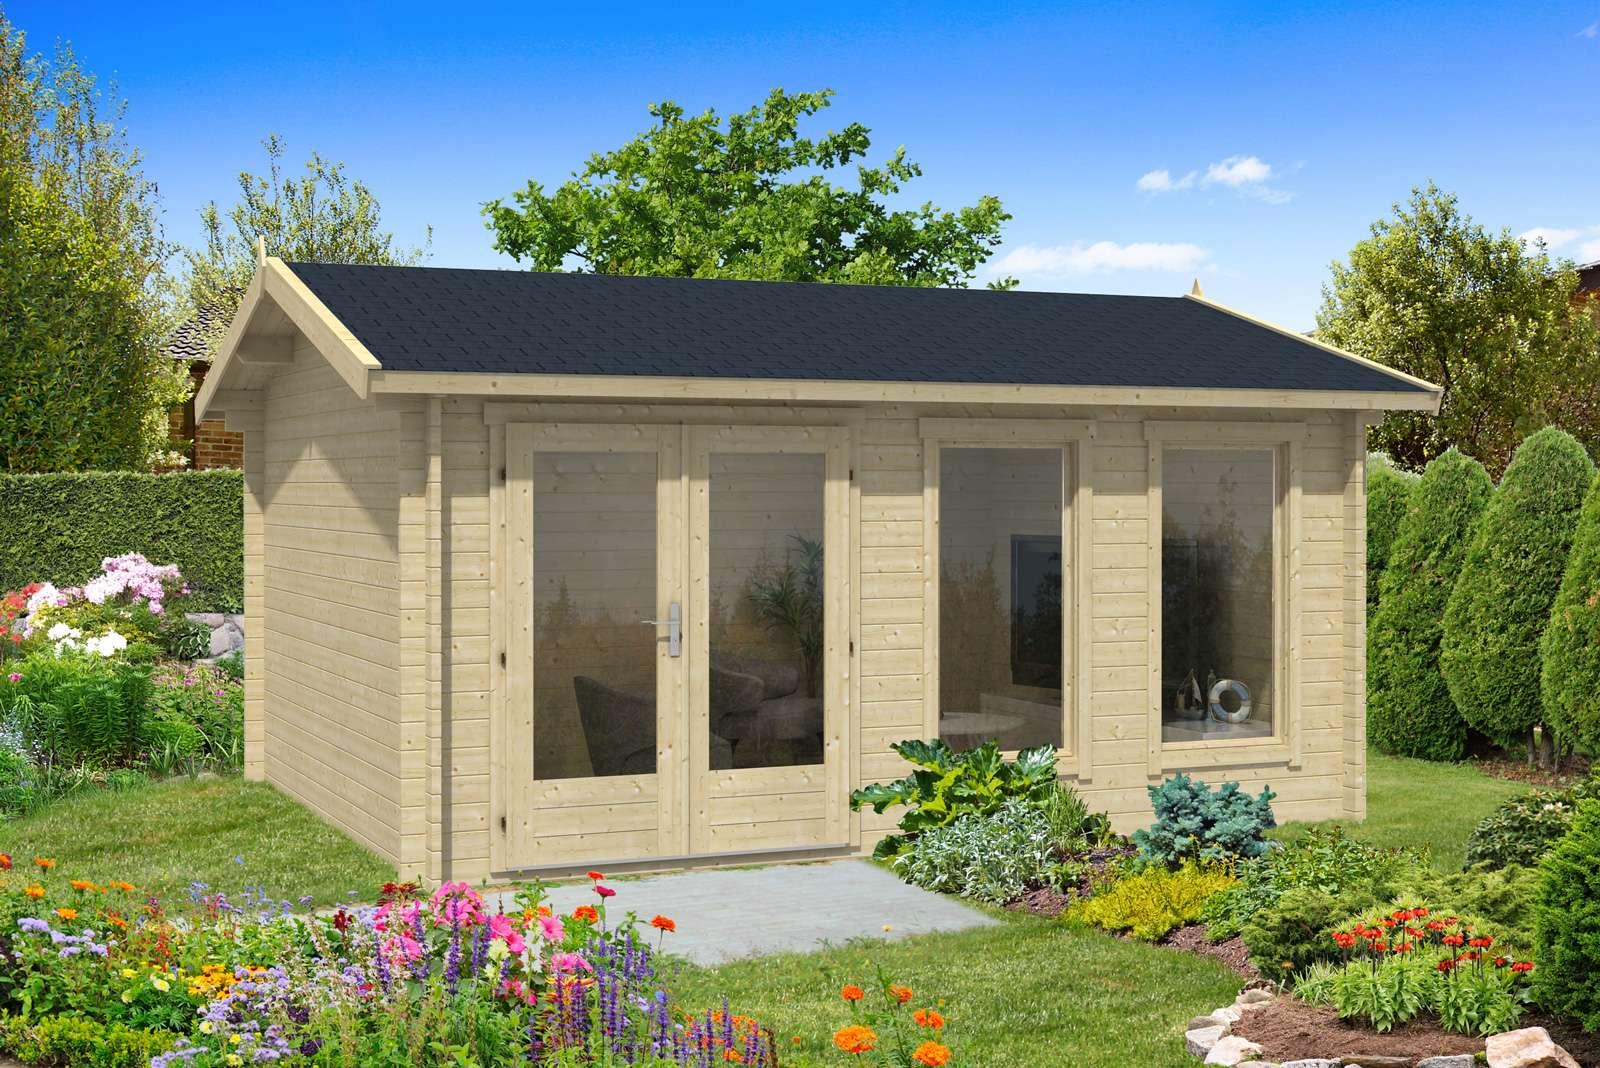 gartenhaus holz 2x3m co37 hitoiro. Black Bedroom Furniture Sets. Home Design Ideas